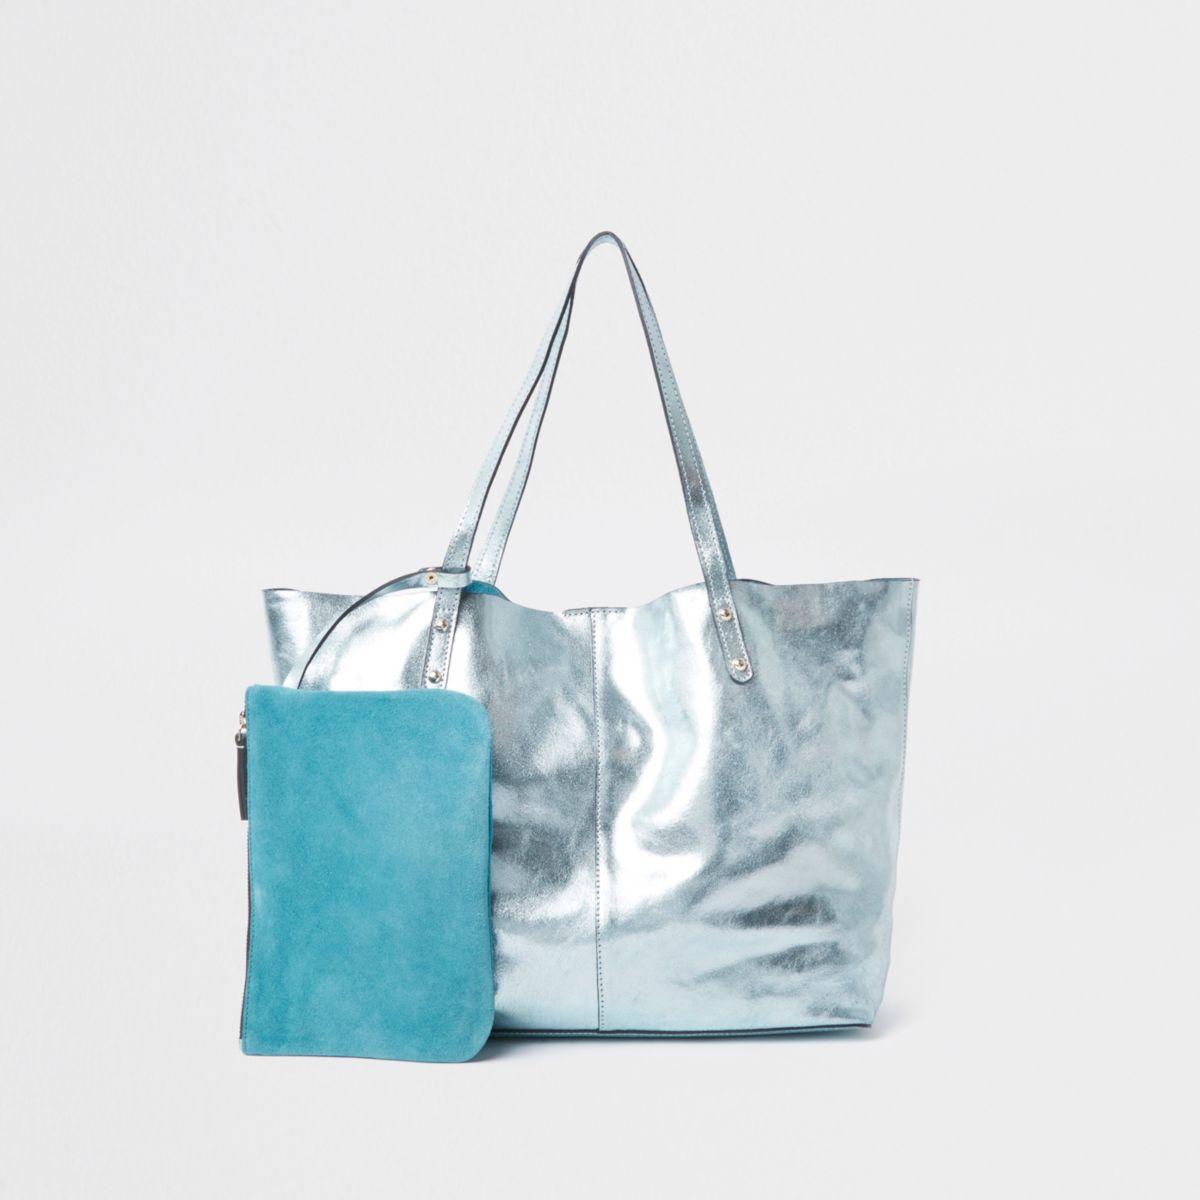 Light blue leather metallic shopper tote bag